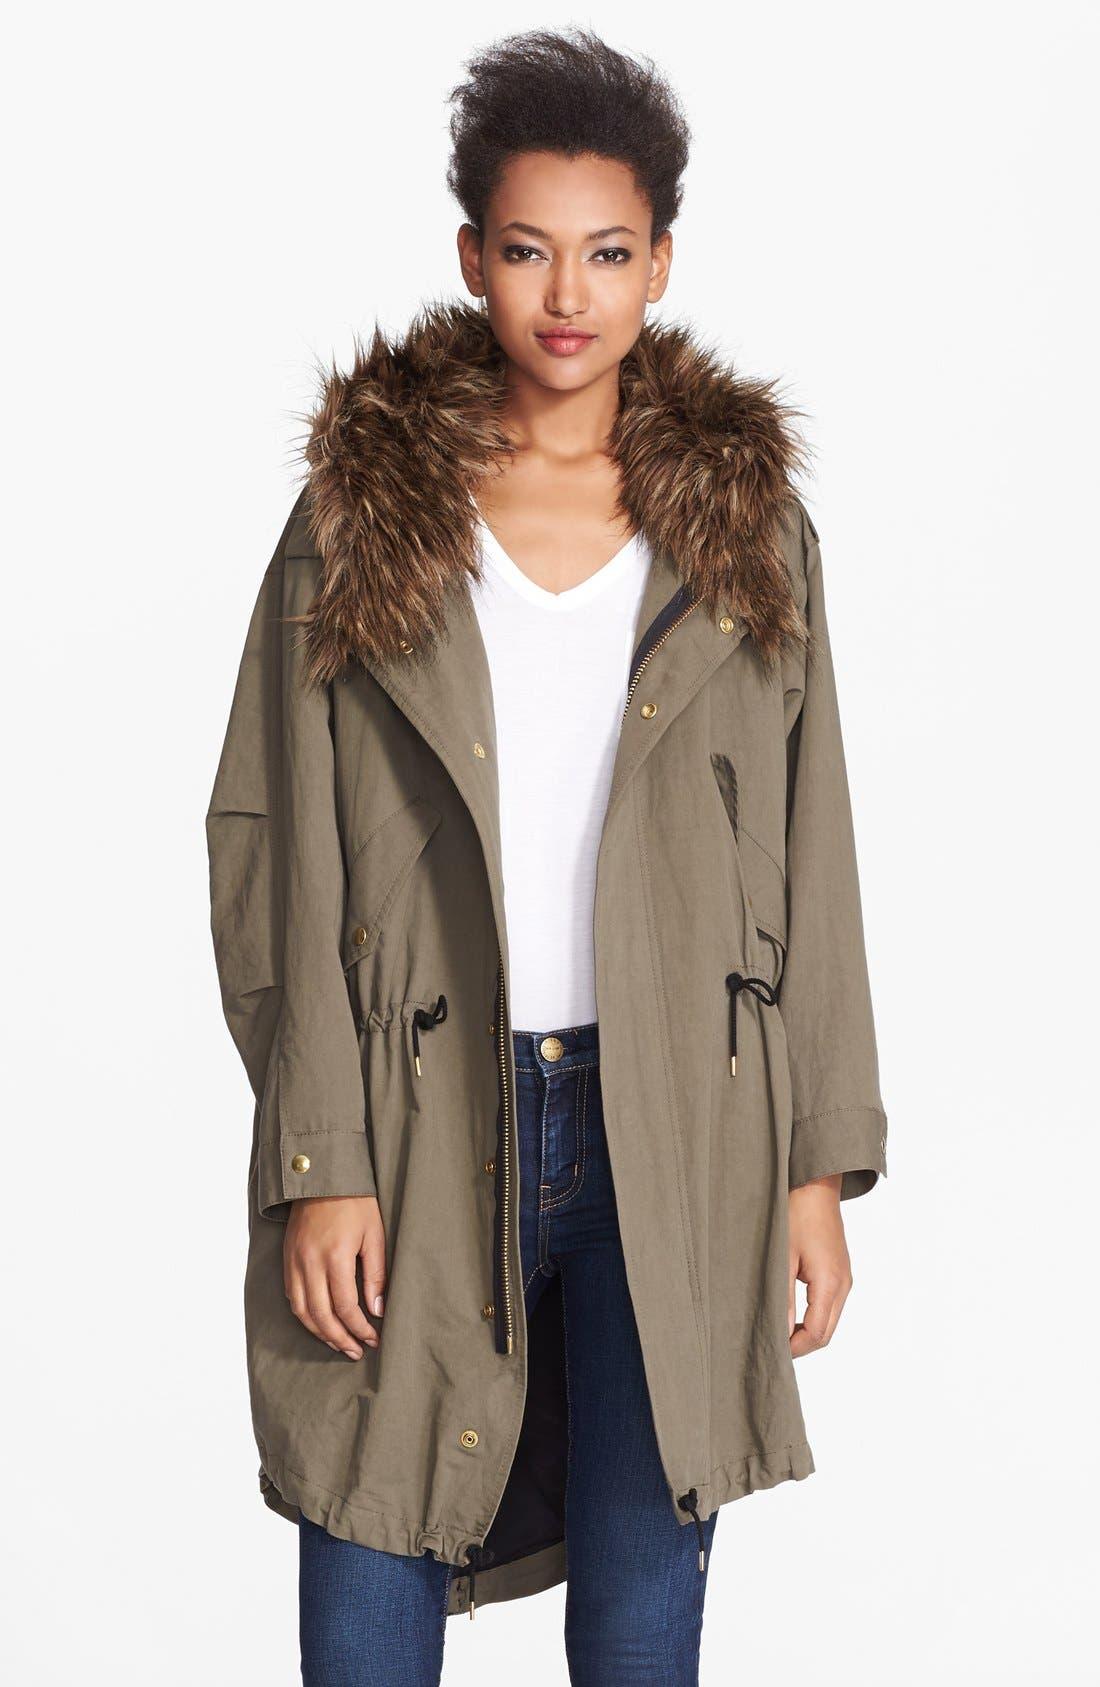 Main Image - Smythe Oversized Anorak with Faux Fur Hood